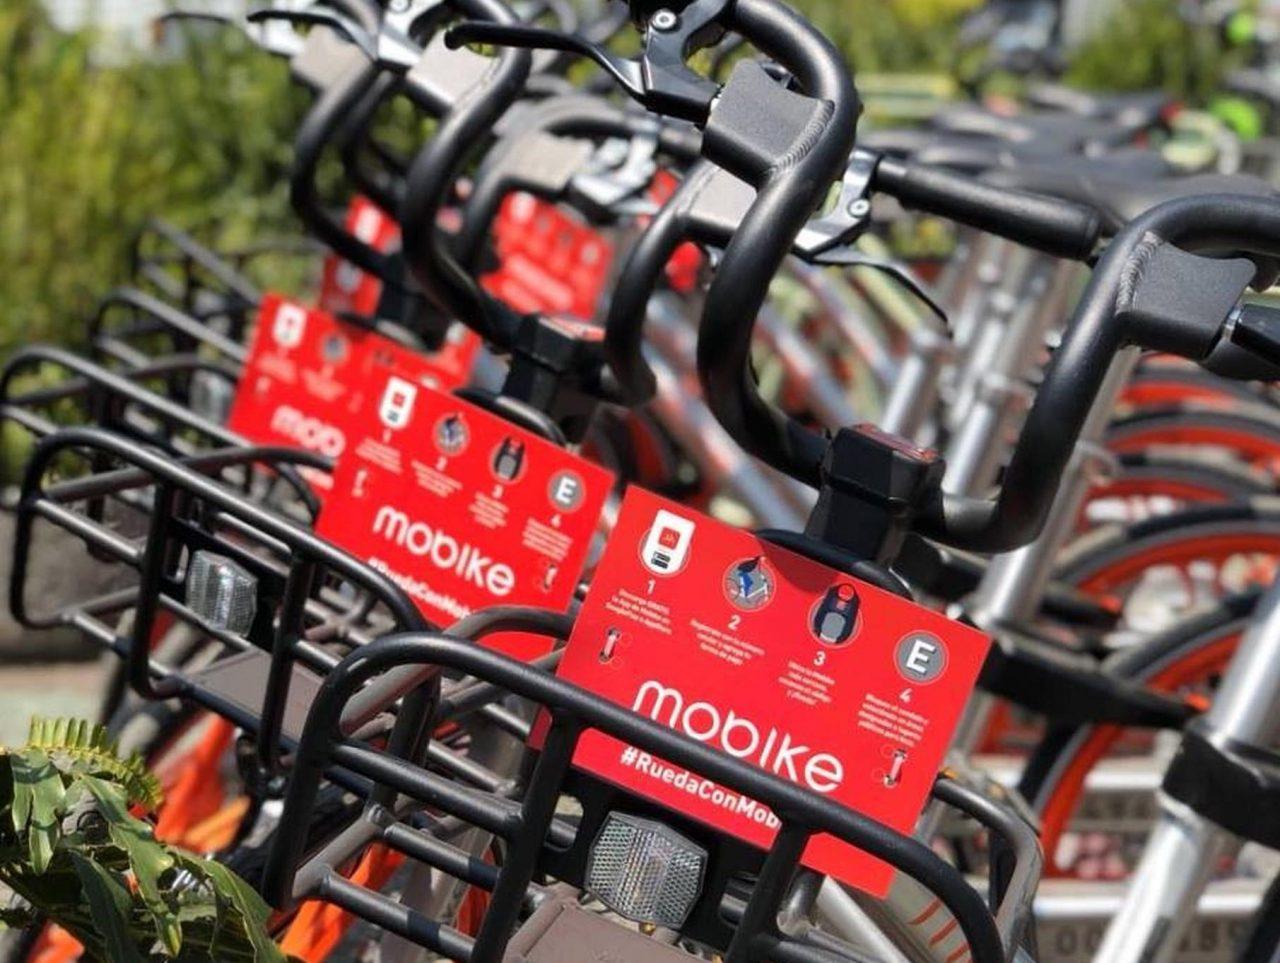 Meituan Dianping comprará Mobike por 2,700 mdd